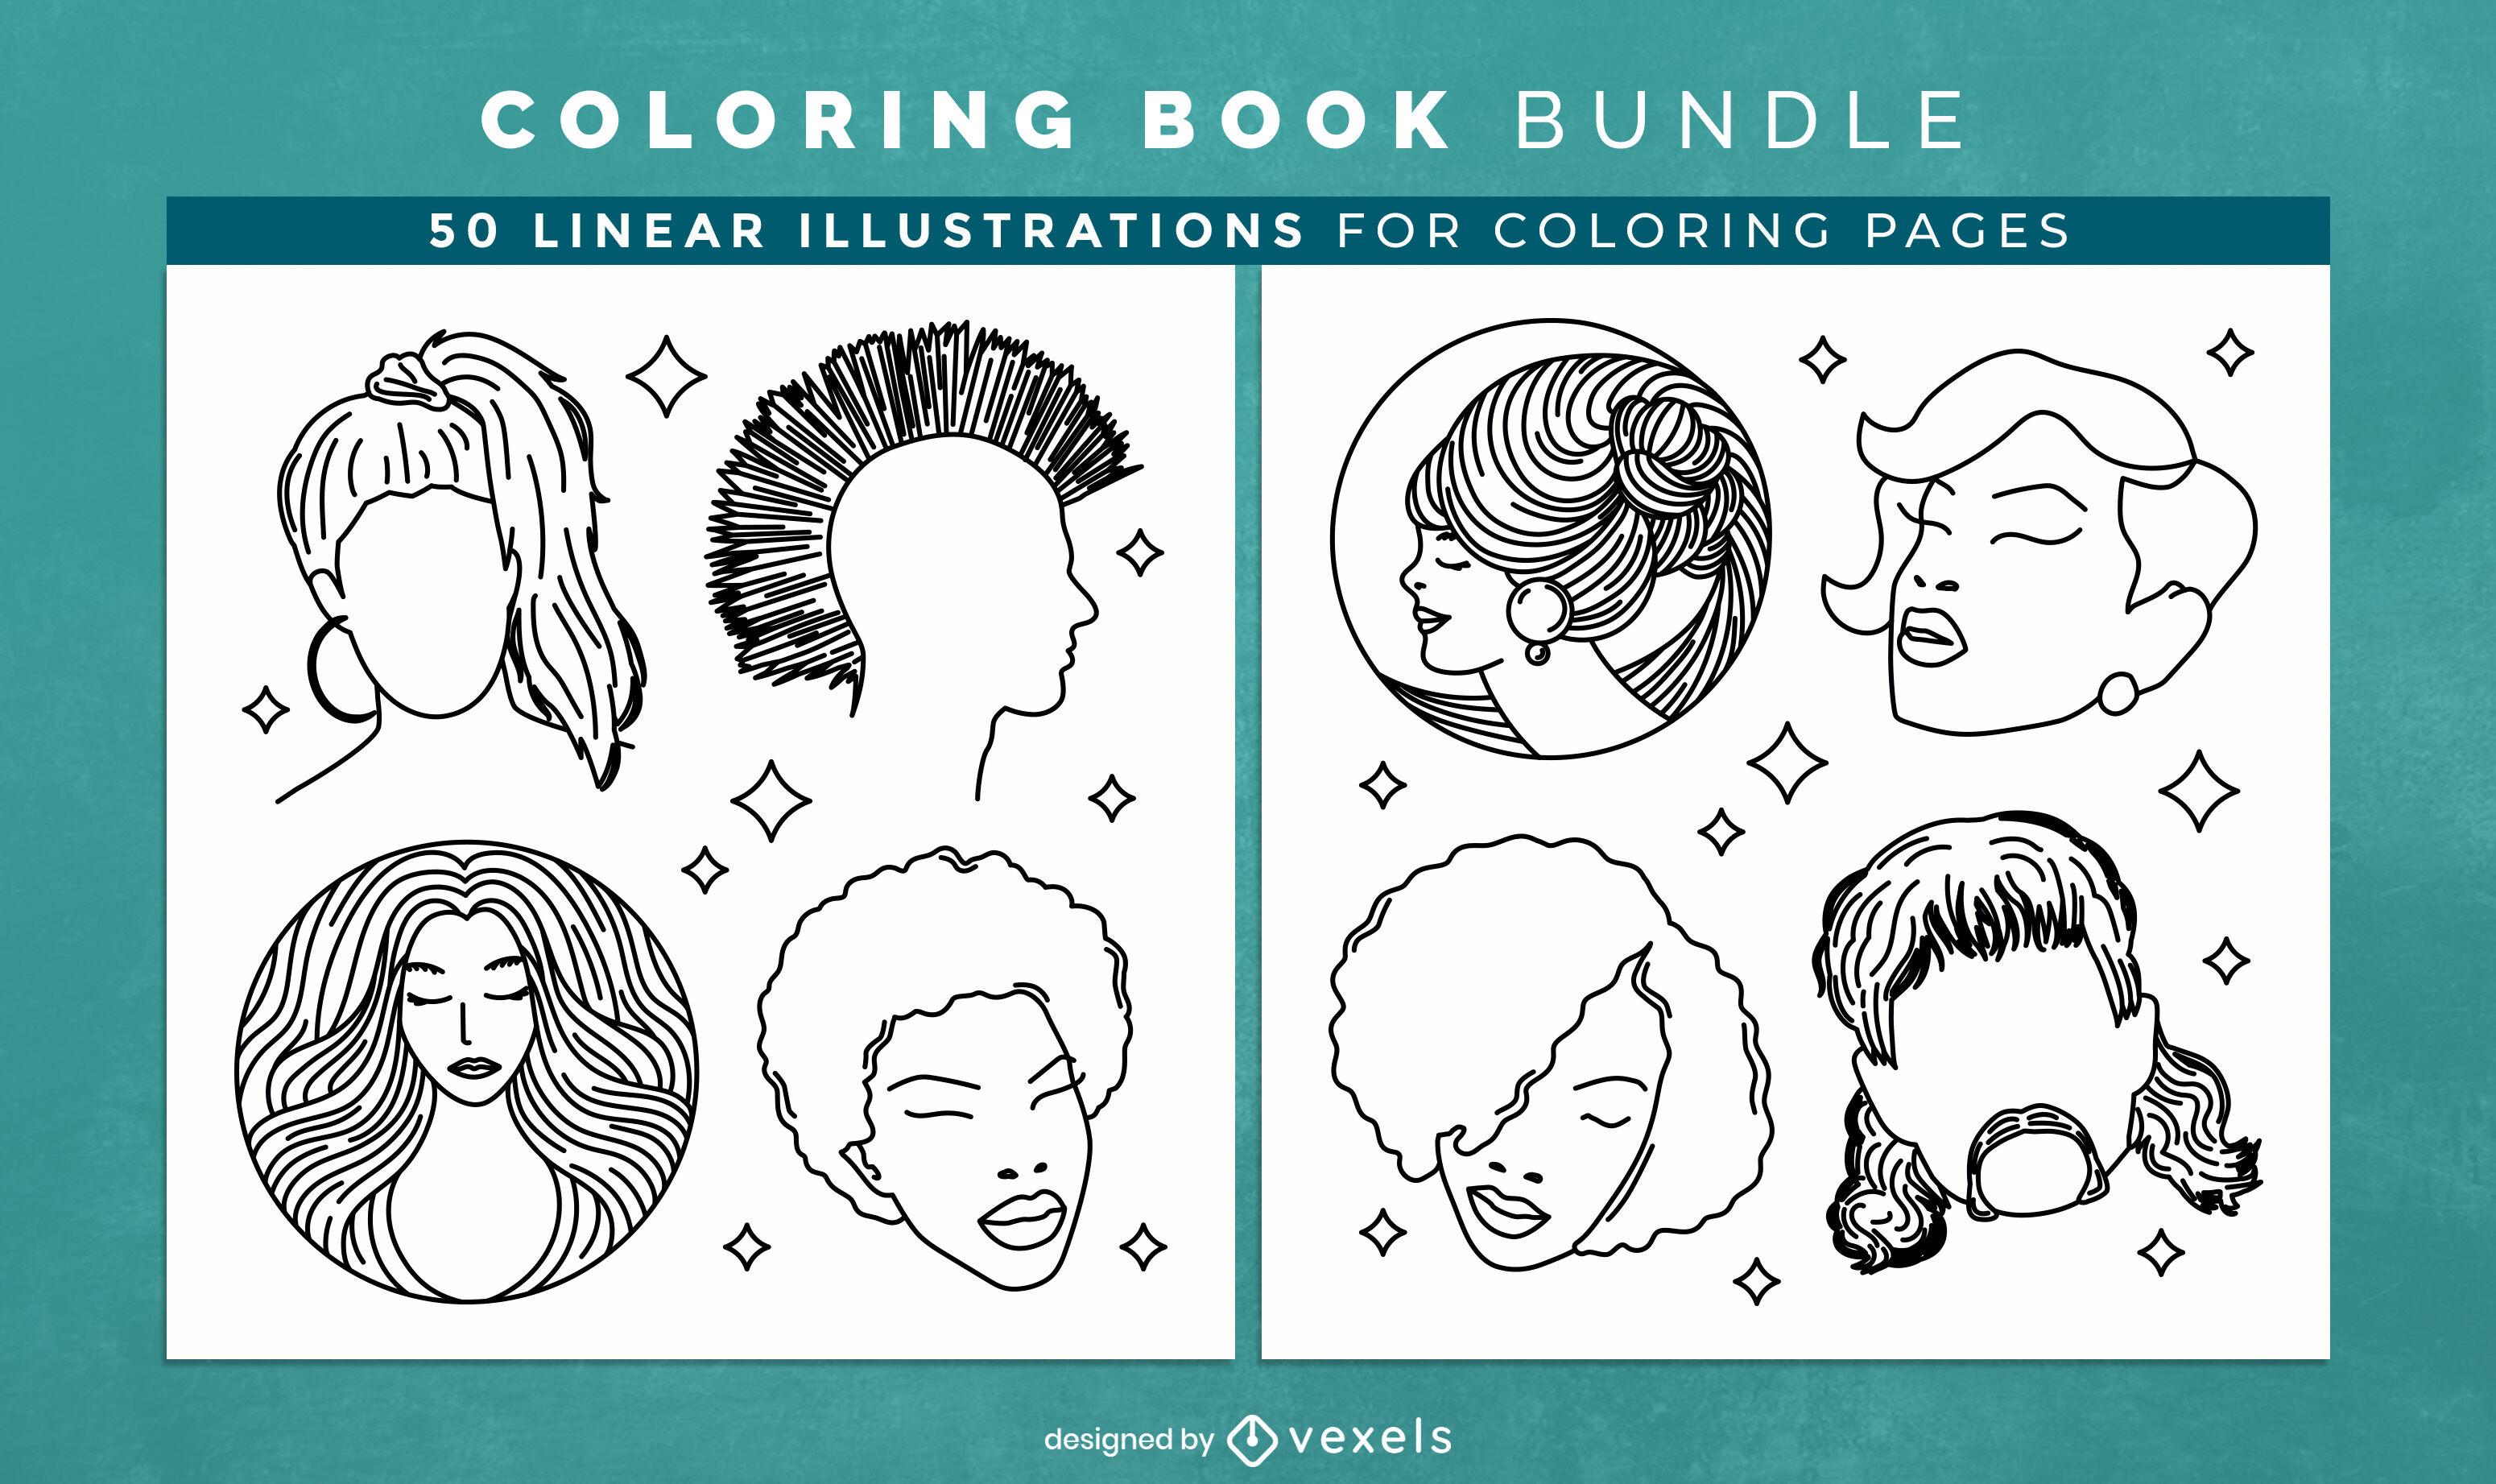 Hairstyles coloring book interior design